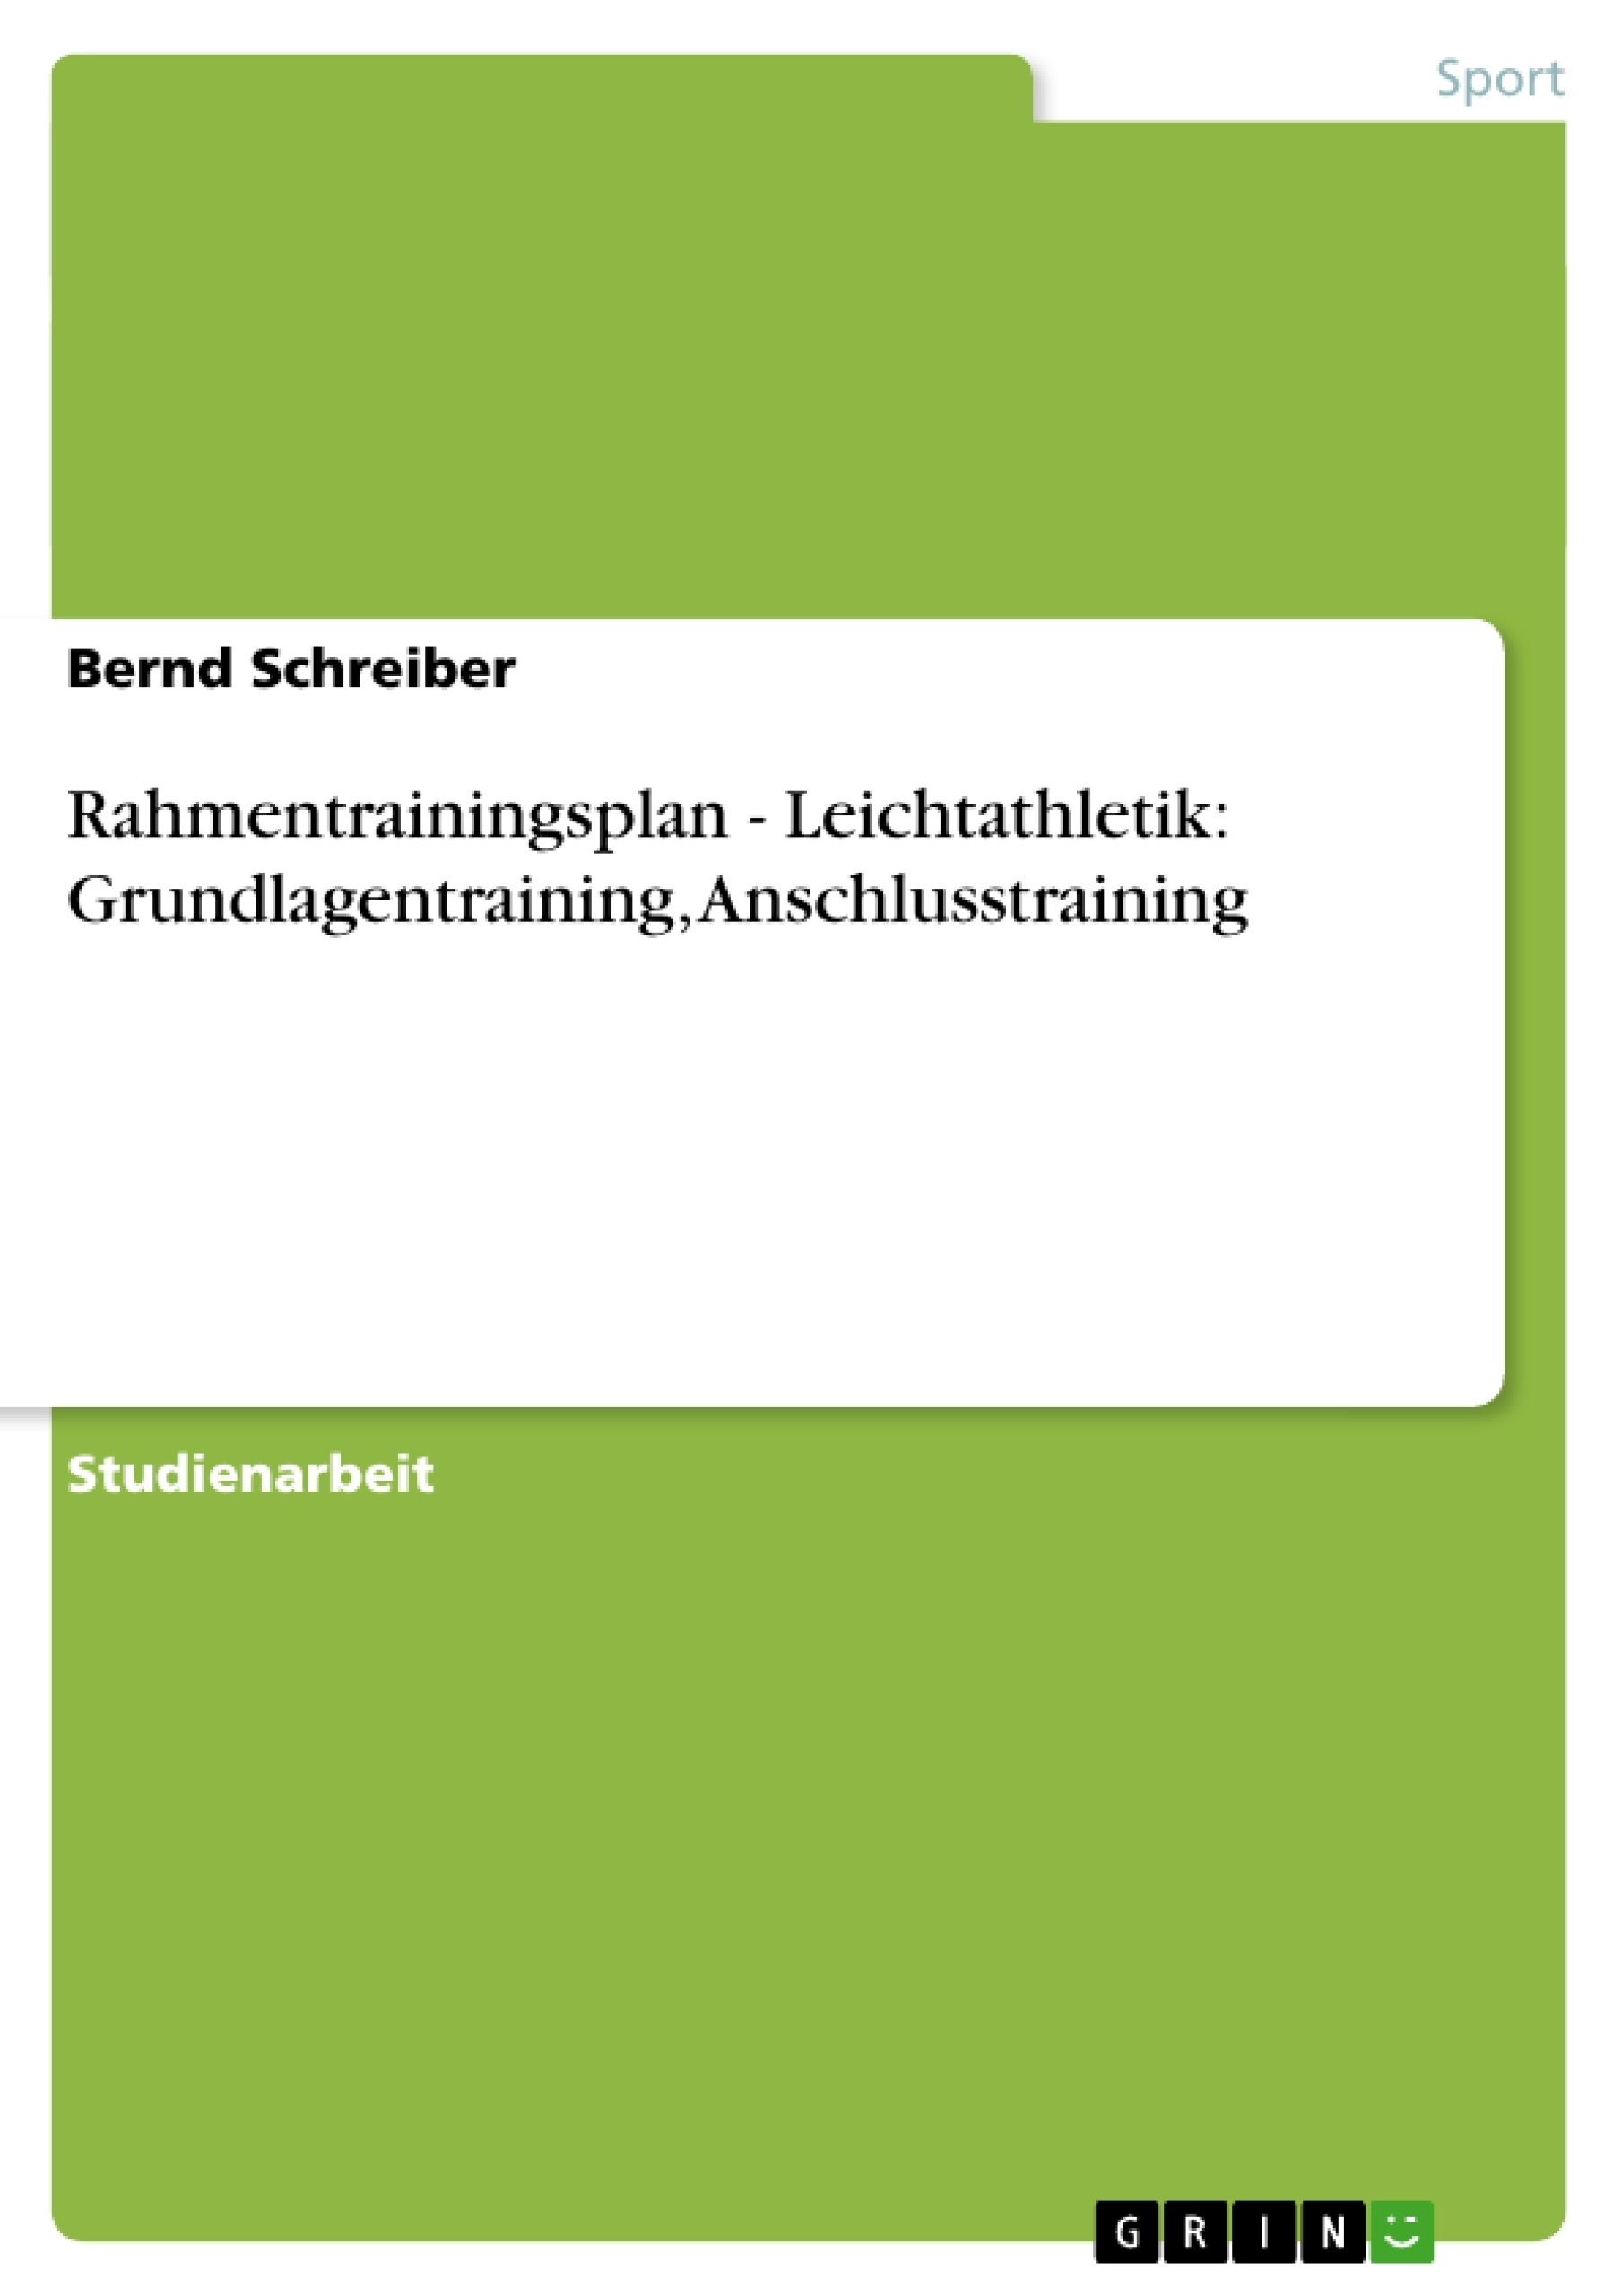 Titel: Rahmentrainingsplan - Leichtathletik: Grundlagentraining, Anschlusstraining